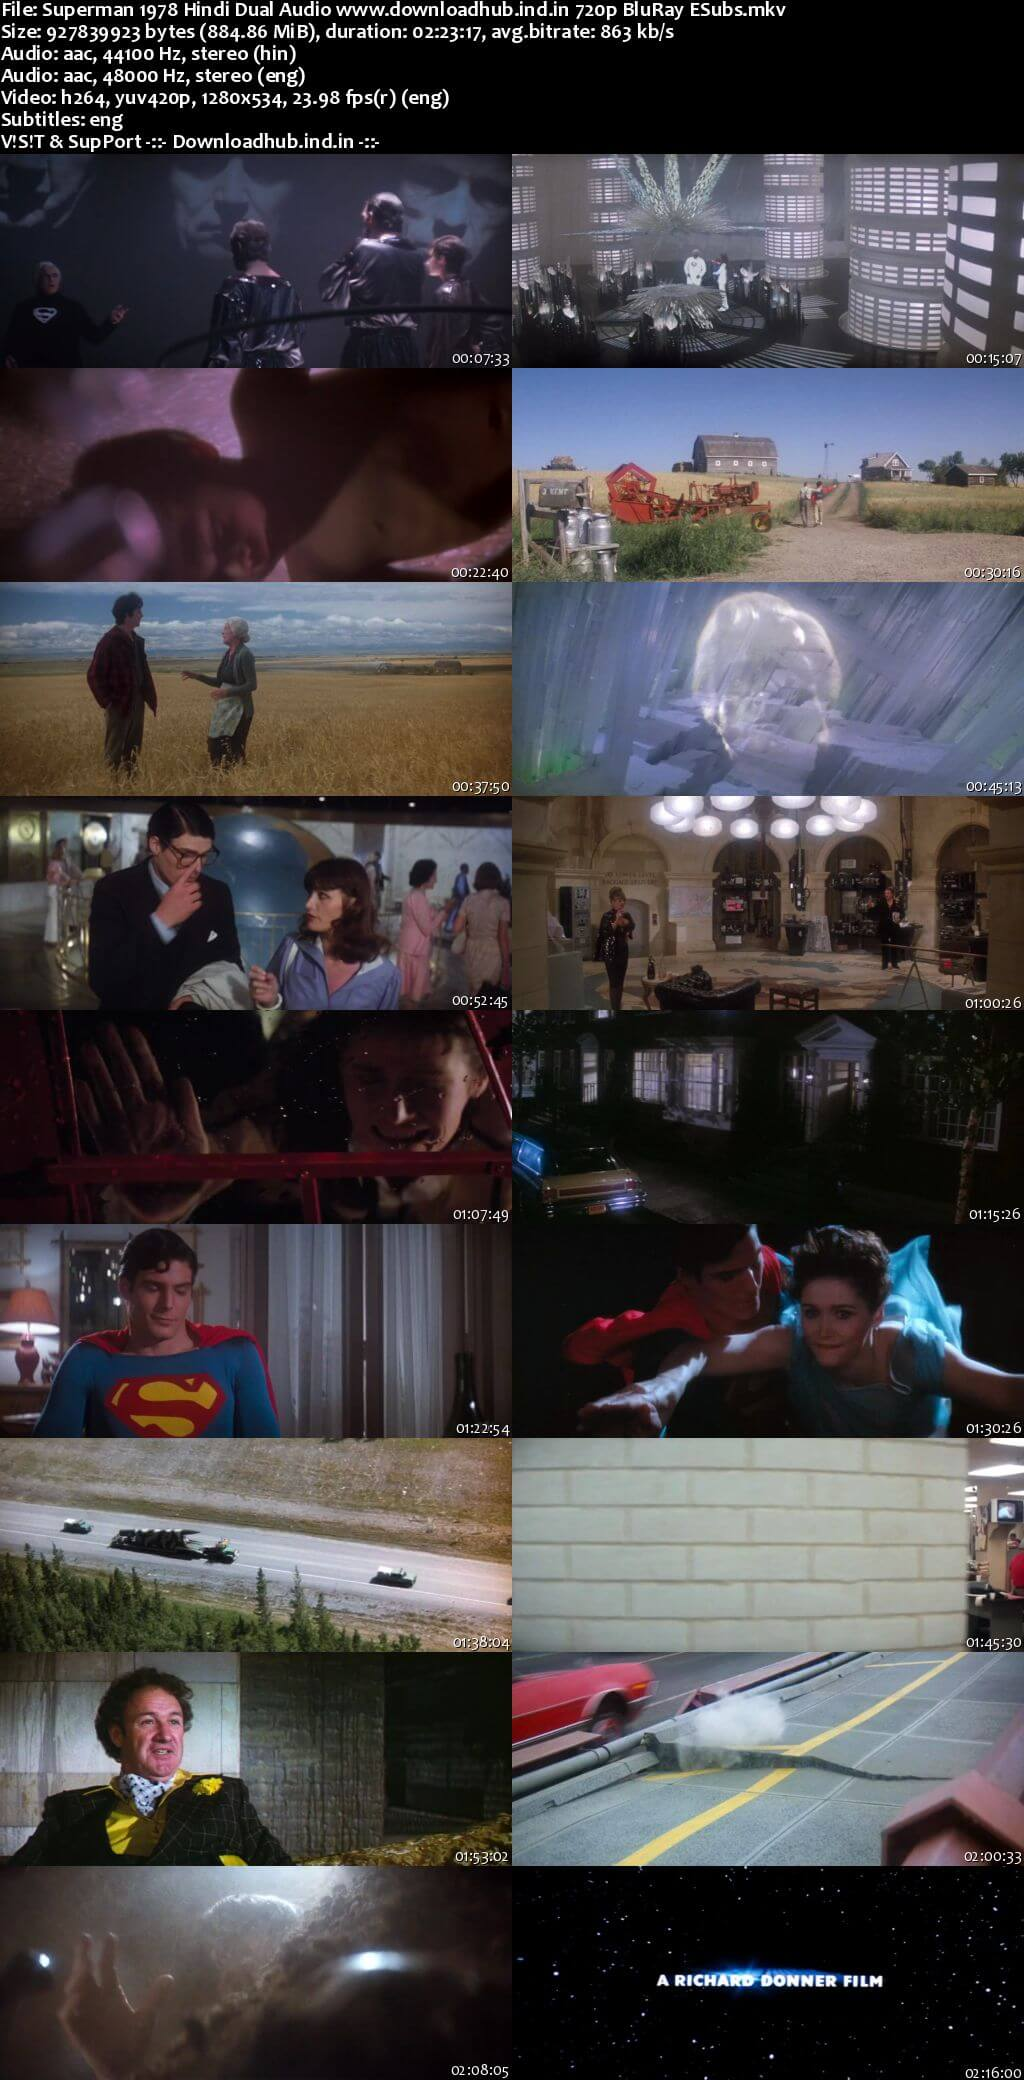 Superman 1978 Hindi Dual Audio 720p BluRay ESubs